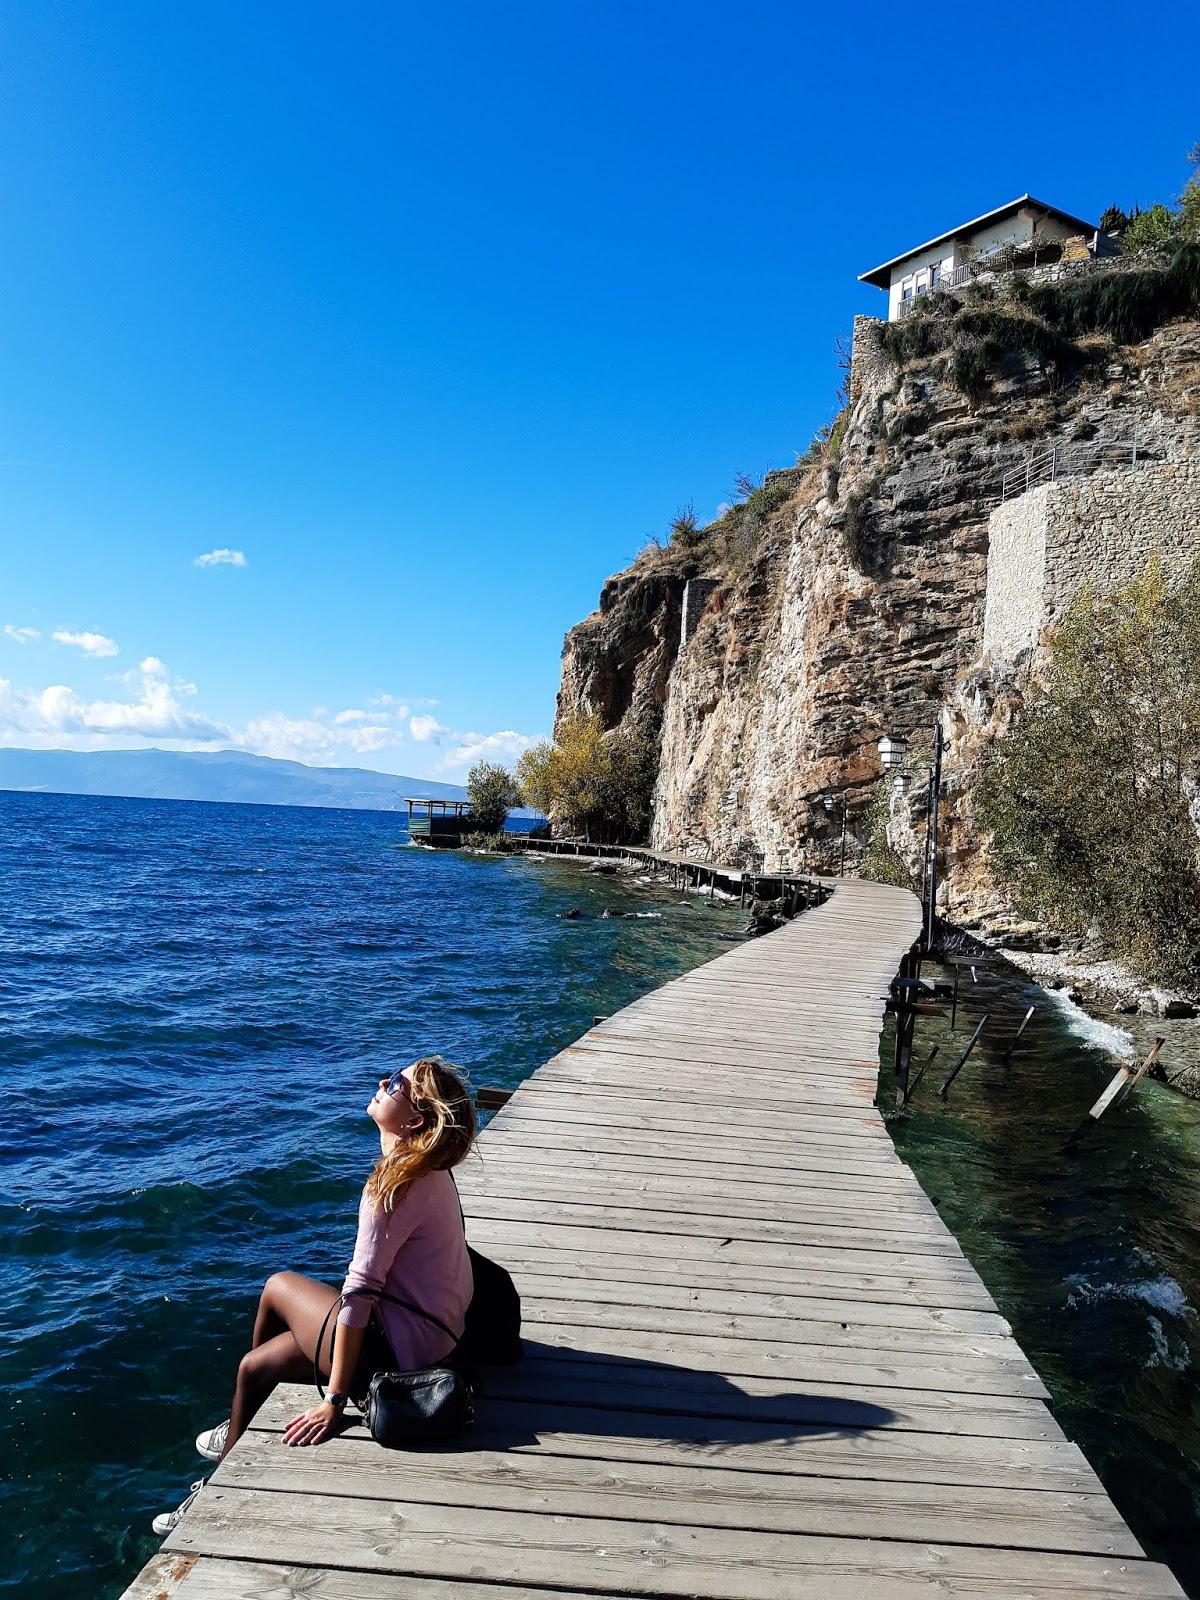 macedonia-jezioro-ochrydzkie